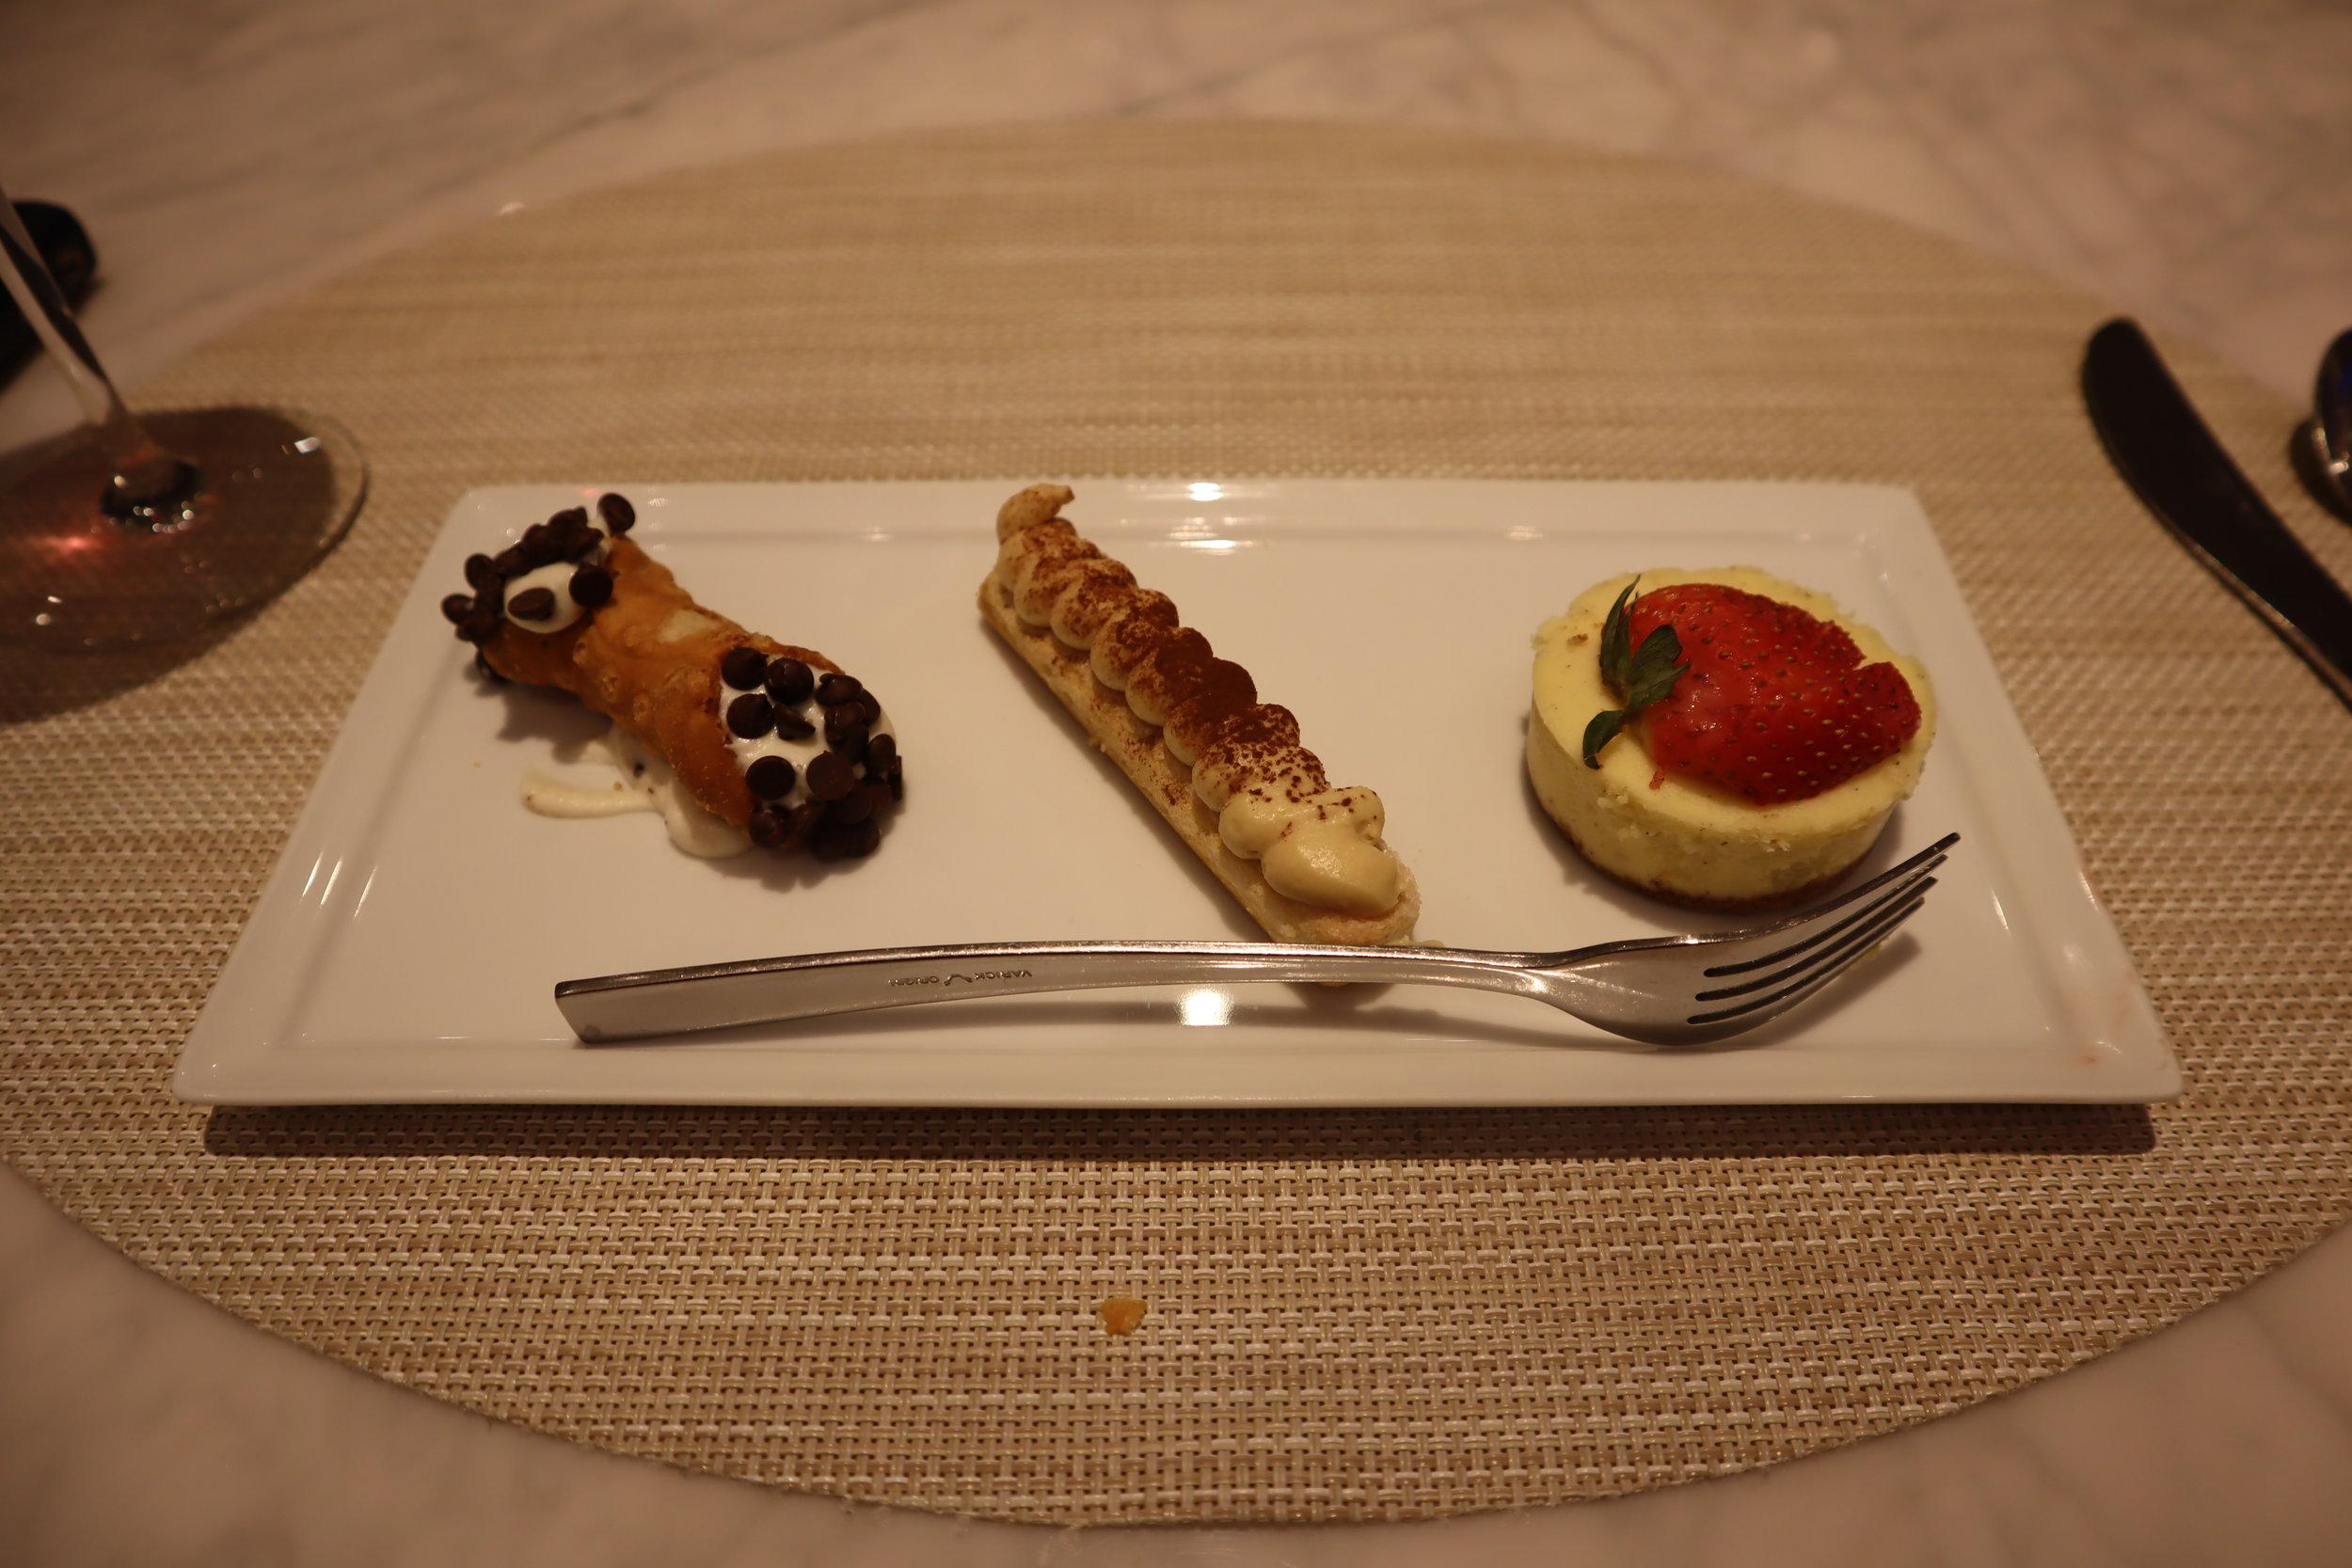 United Polaris Lounge Newark – New Yorker dessert trio